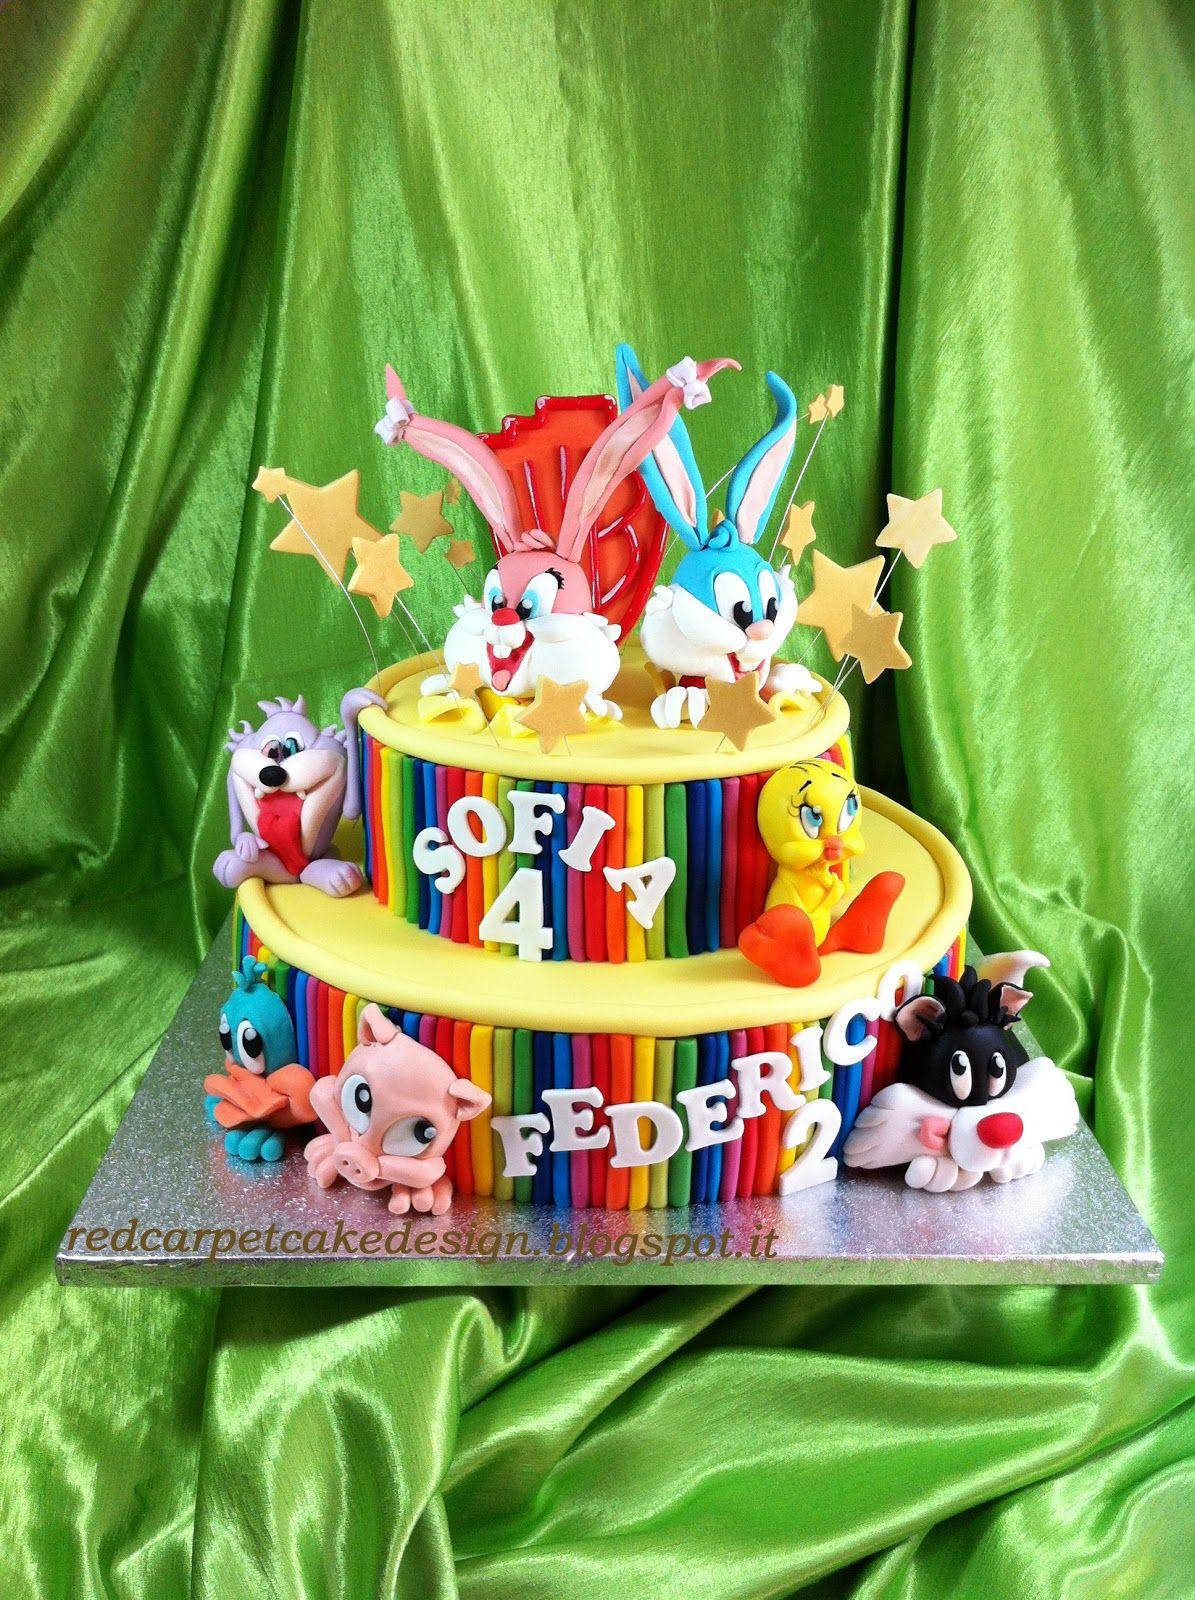 TINY TOONS CAKE By Red Carpet Cake Design